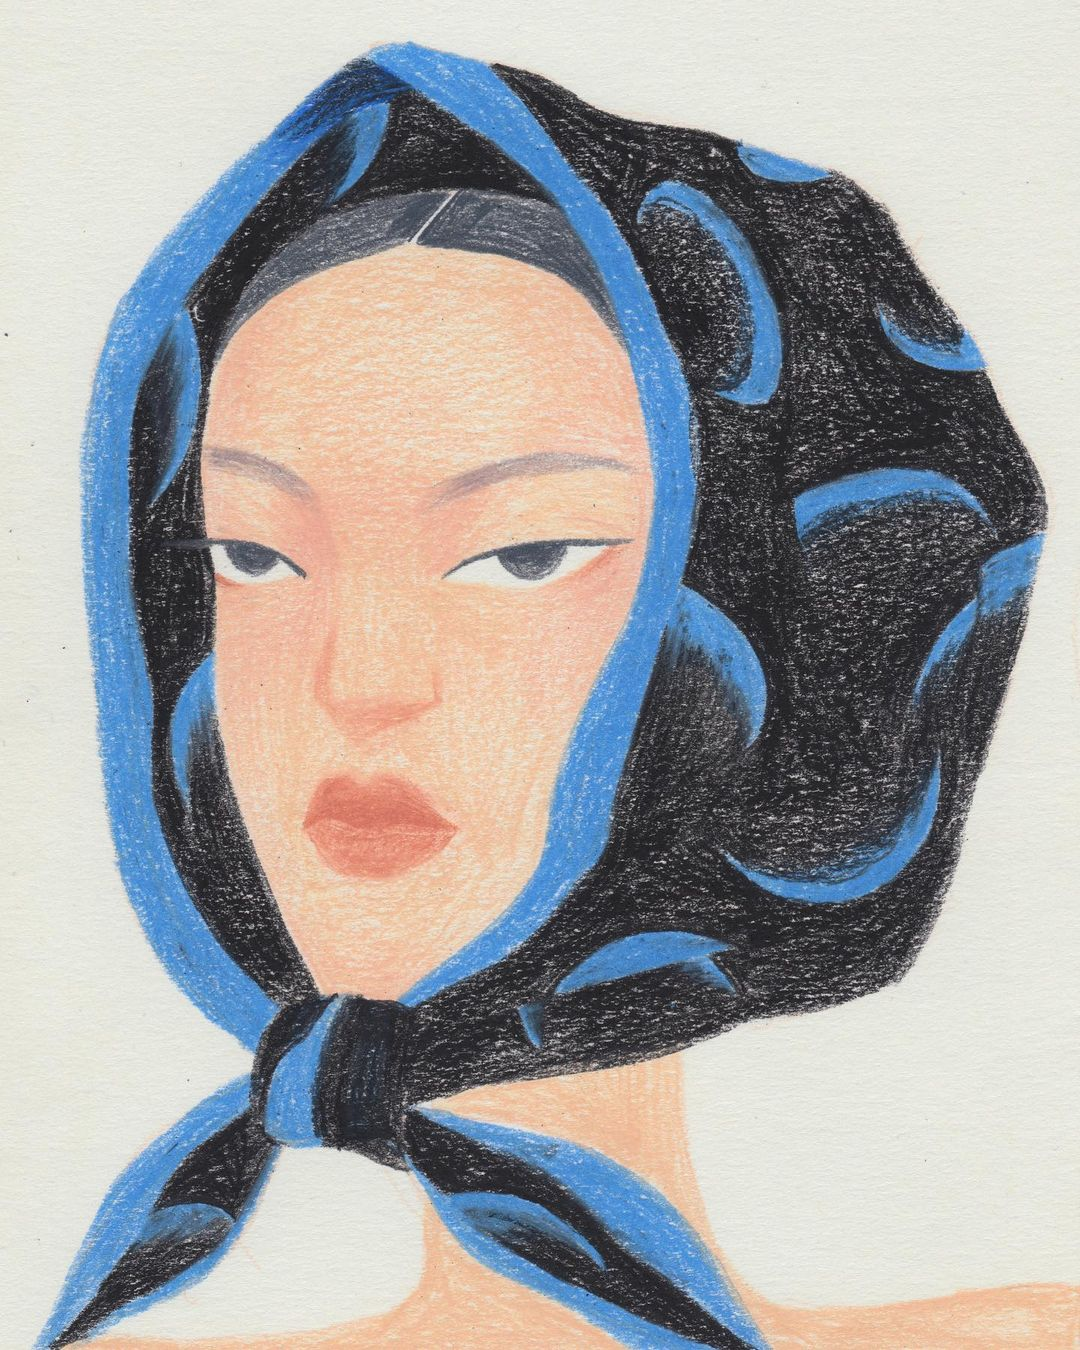 Jiayue Li's Empowered Female Protagonists 15